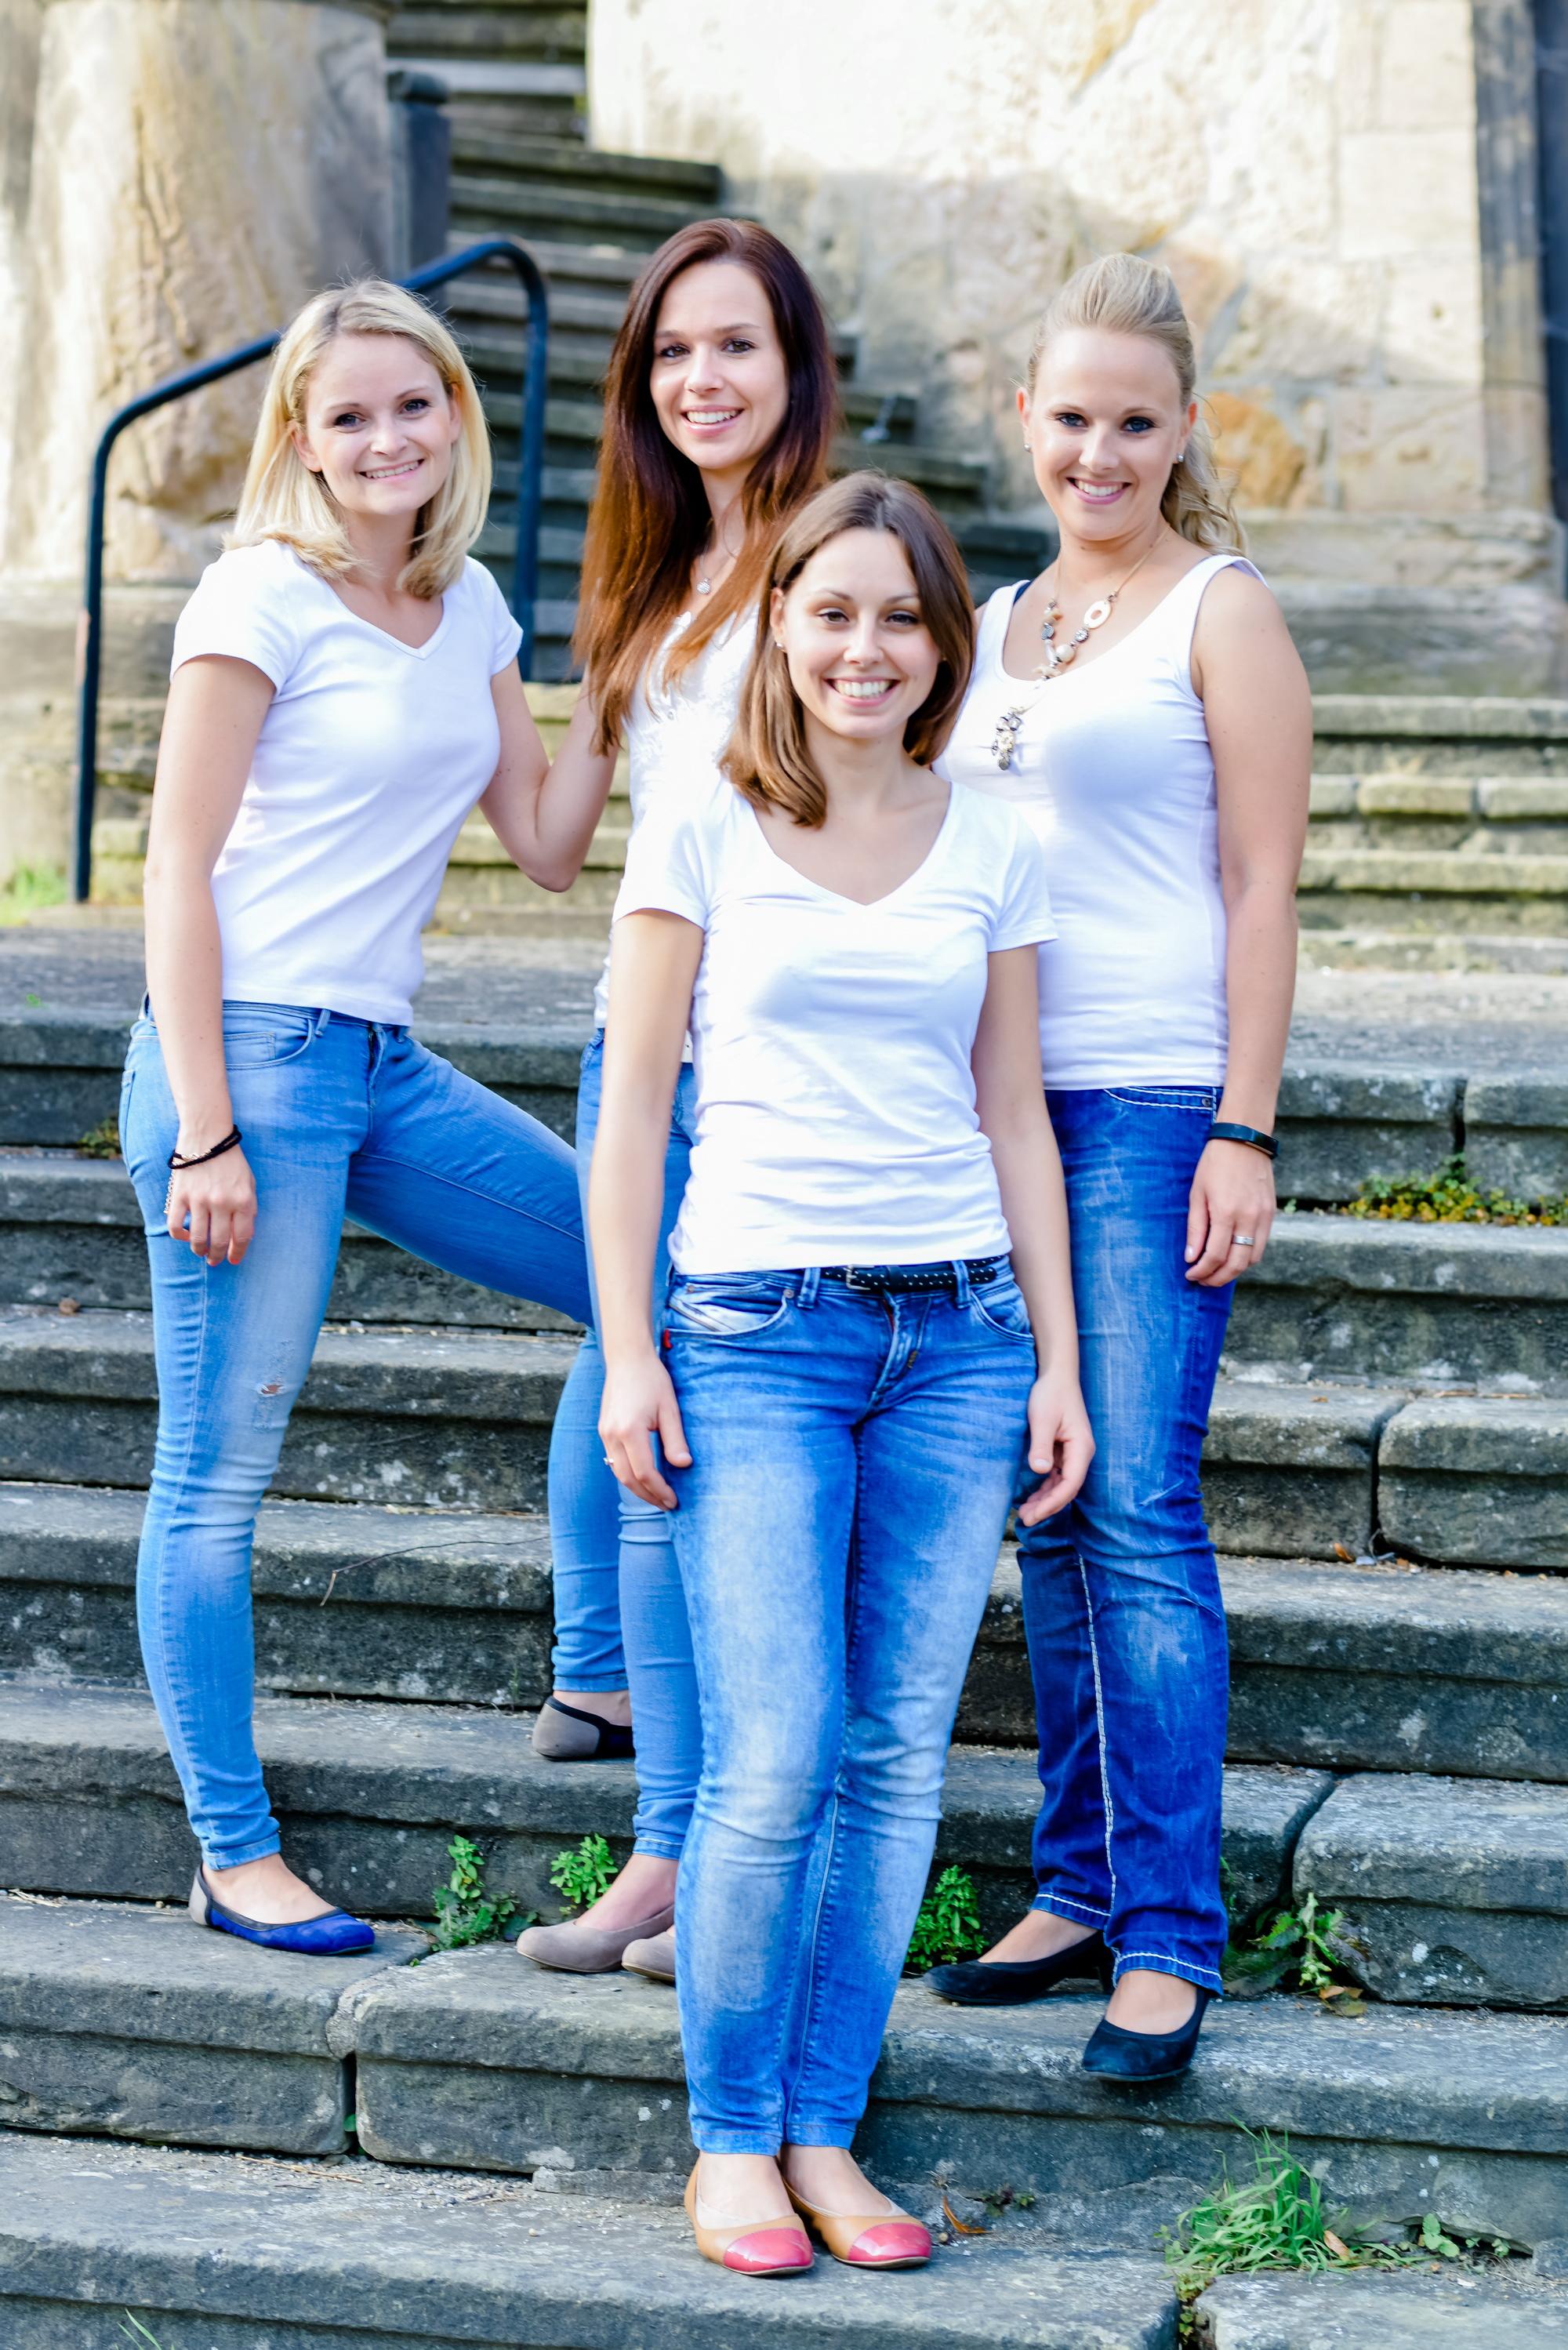 vickyfriends-9_bildgroesse-aendern